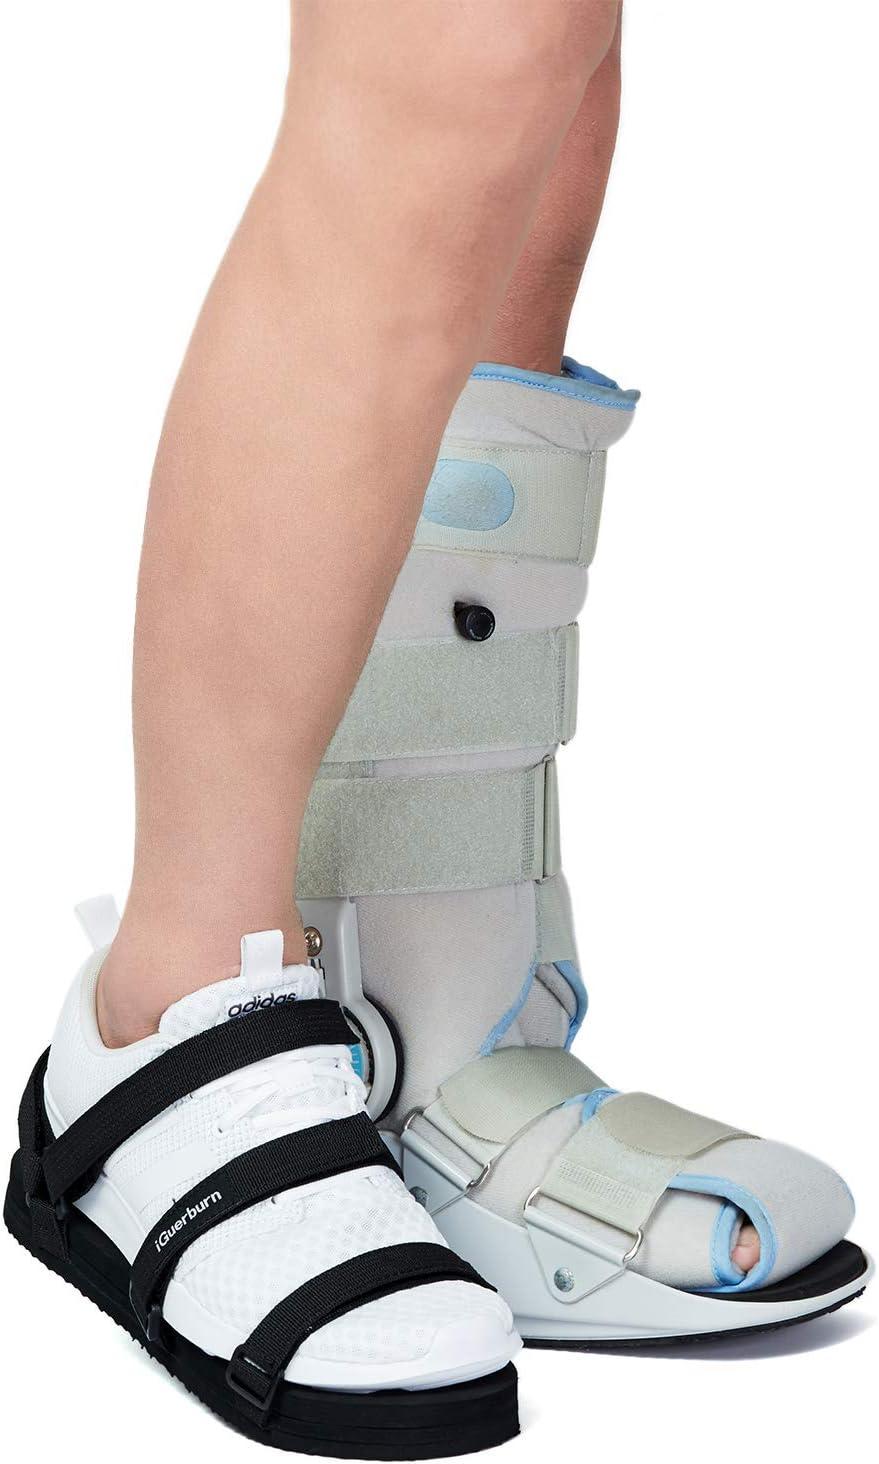 iGuerburn Shoe Balancer Max 46% OFF Lift for Leveler Boot Regular store Walking